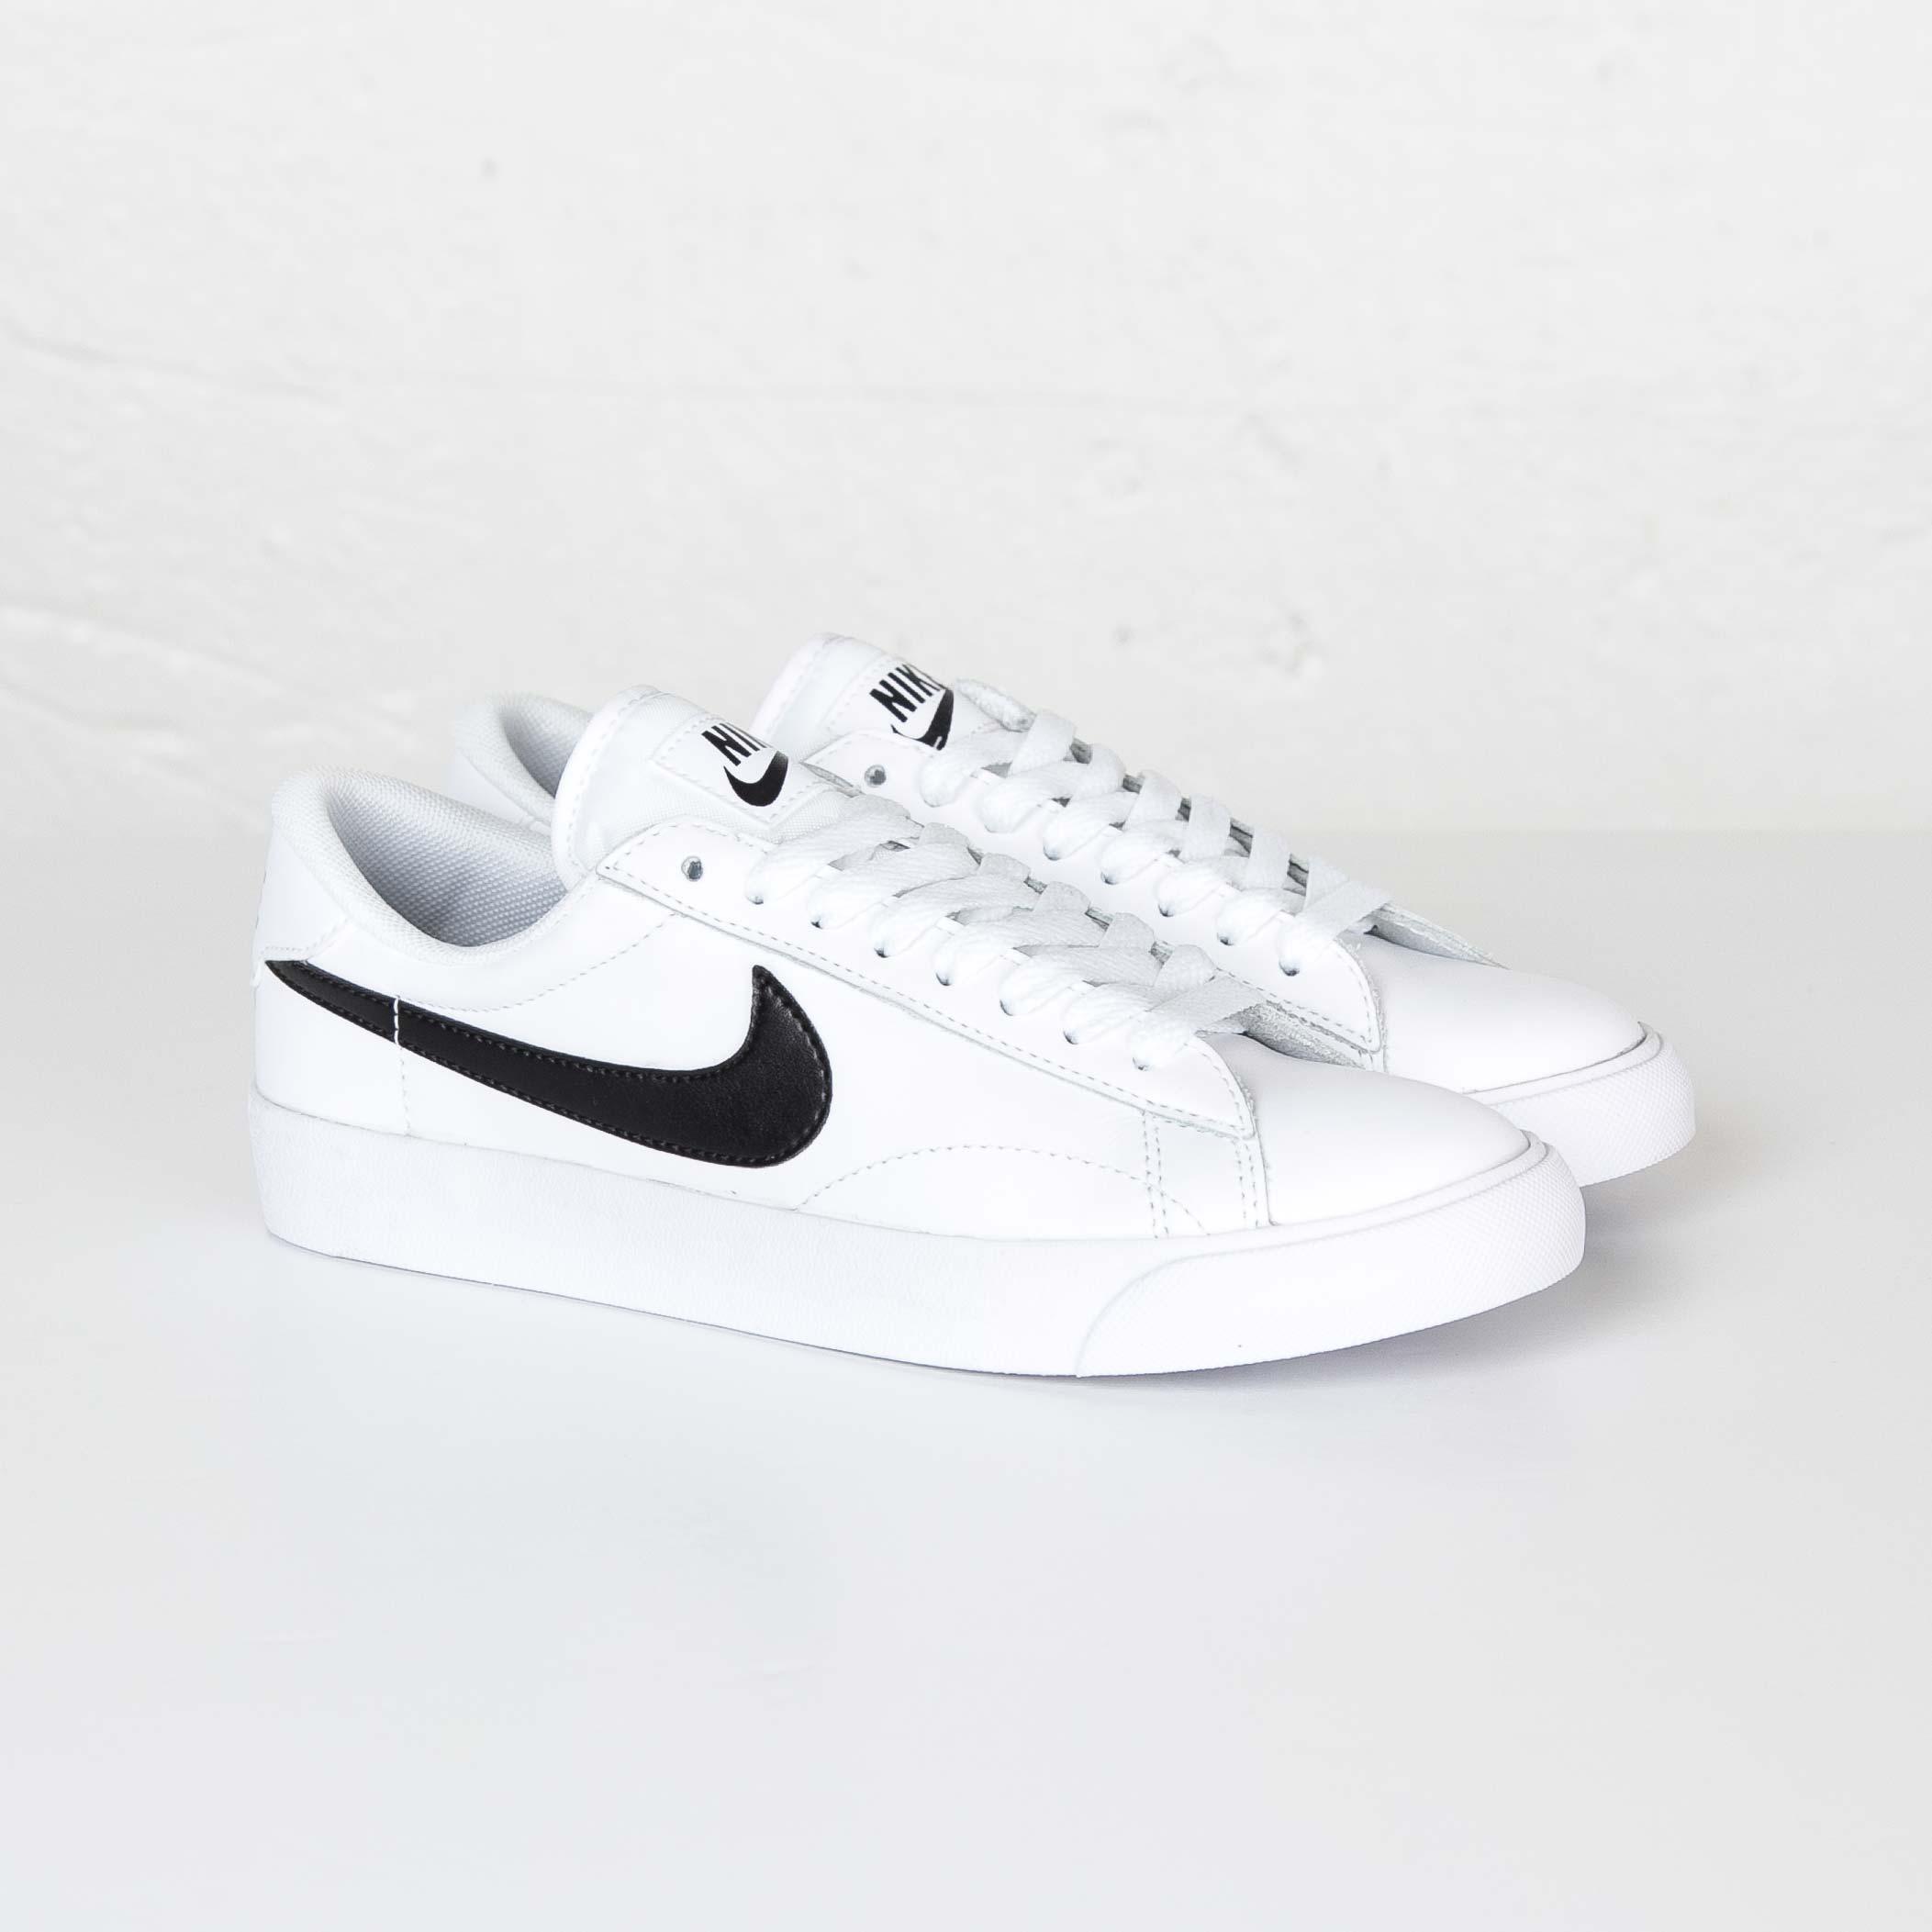 size 40 1dc99 d9ac7 Nike Wmns Tennis Classic AC